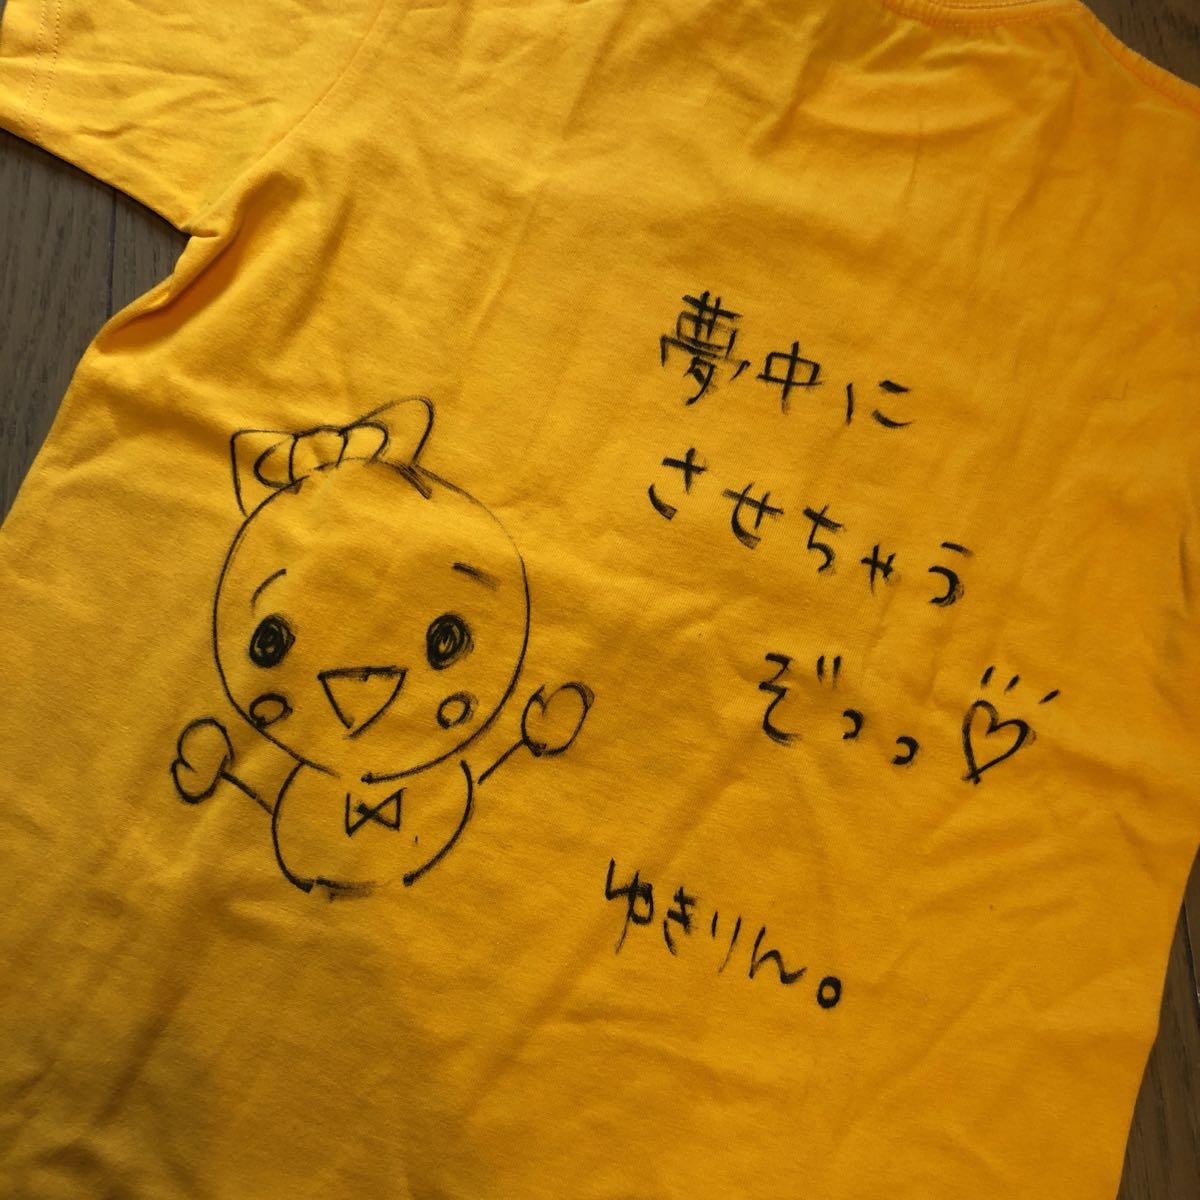 NMB48 トレーディングコレクション Bコース 直筆サイン入りTシャツ☆柏木由紀☆ AKB48